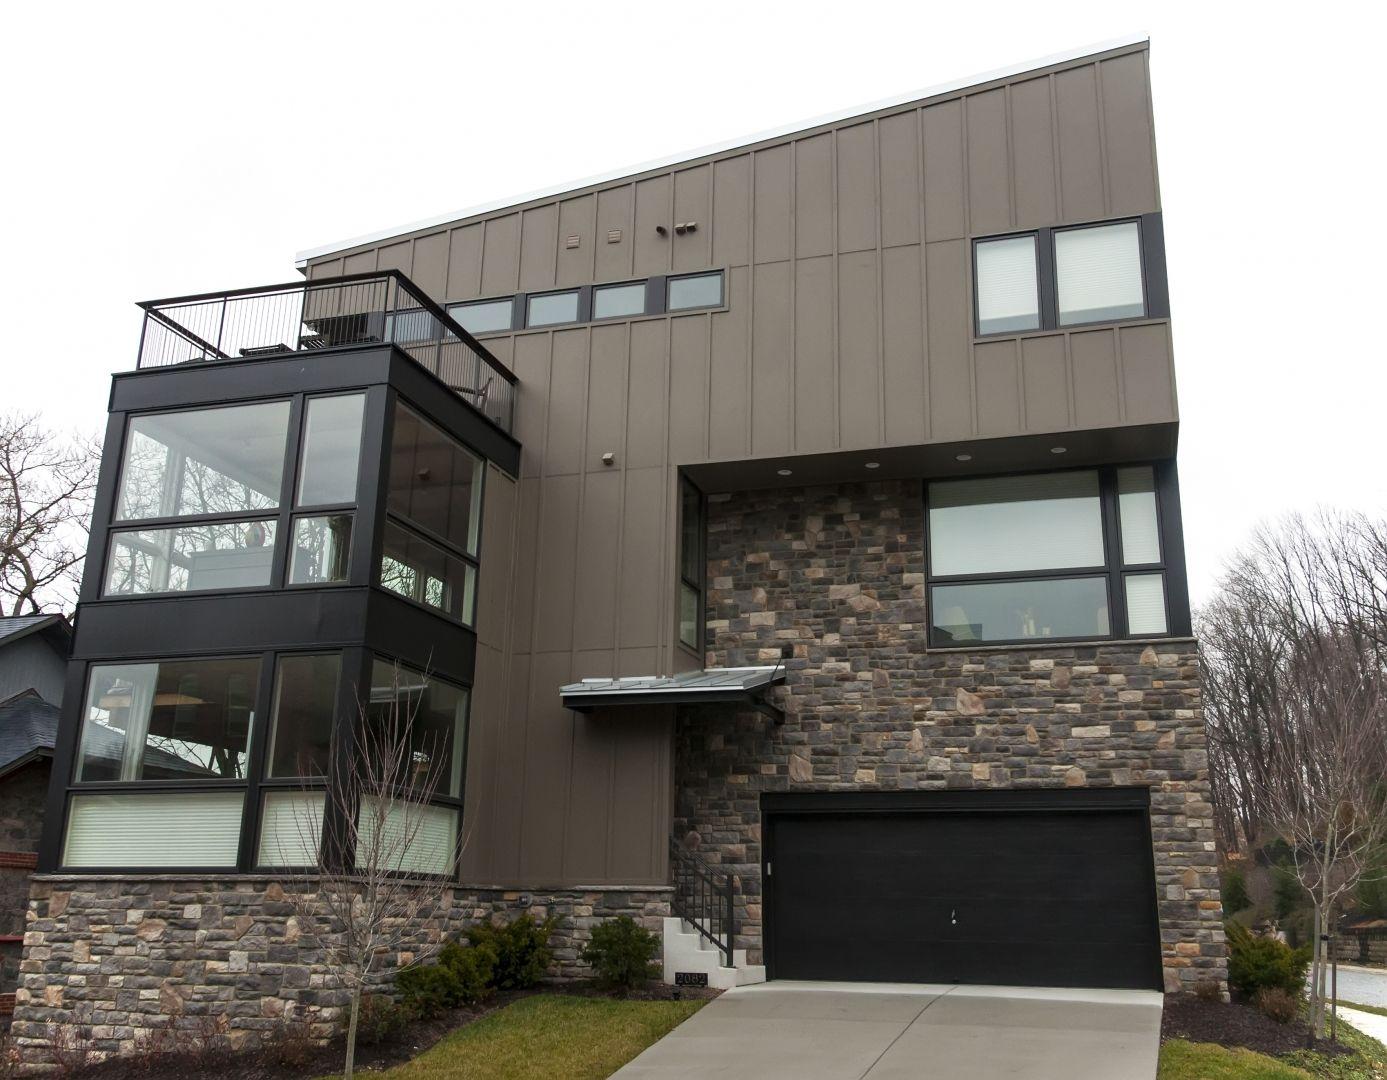 Amazing Modern House Siding Ideas | Home Design and Decor ... on Modern Vinyl Siding Ideas  id=81587